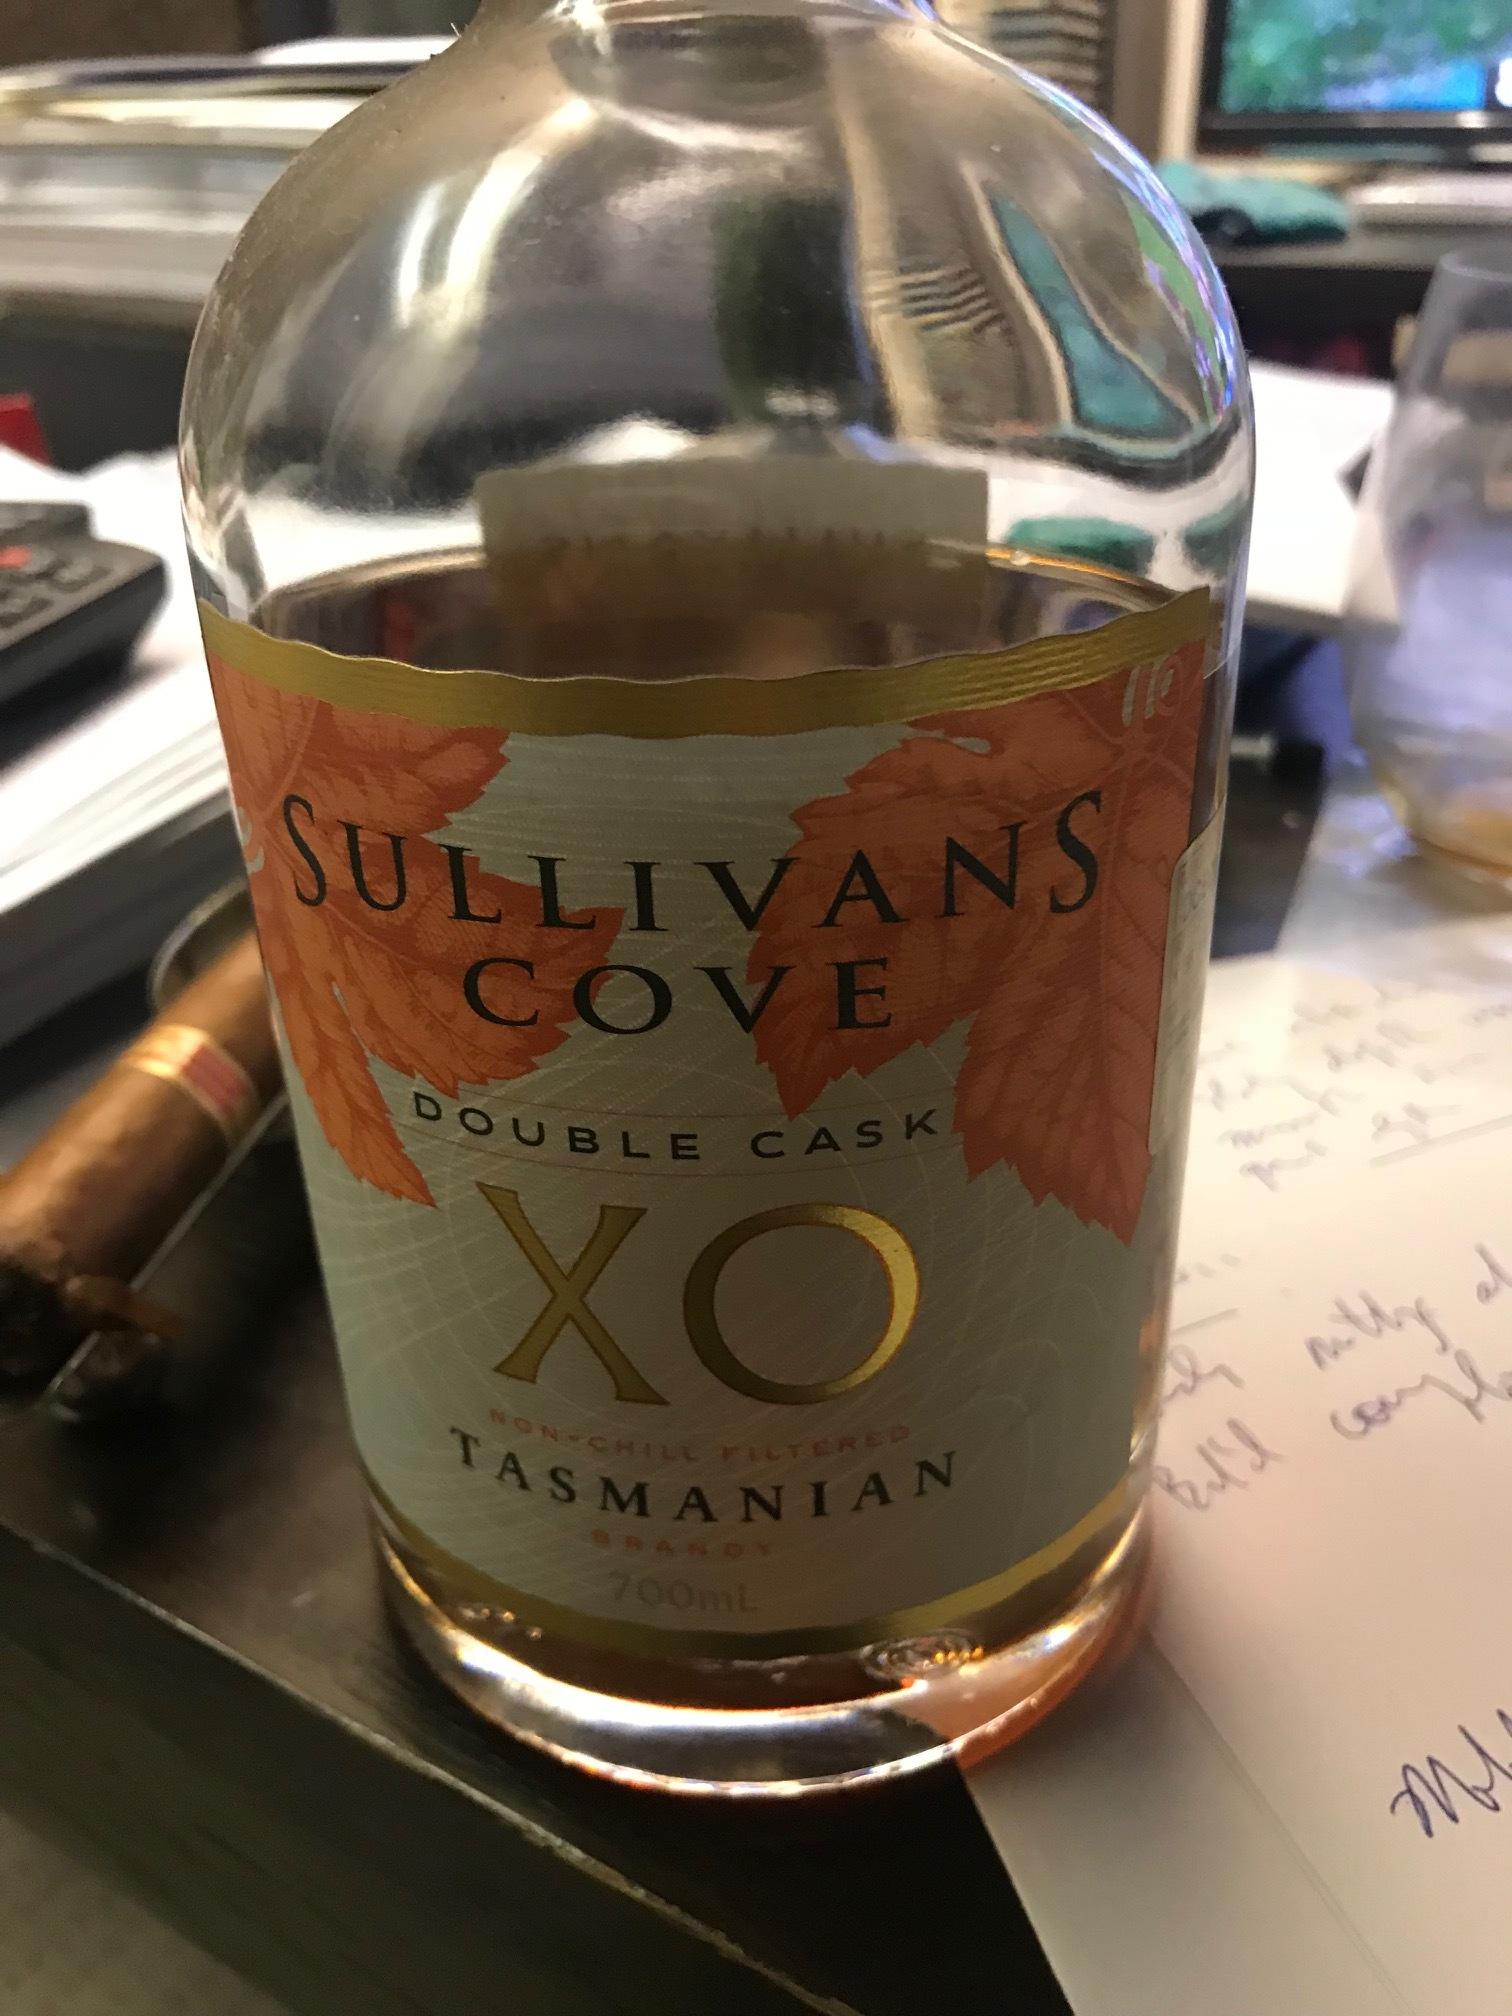 Sullivans Cove Double Cask XO Brandy.jpg